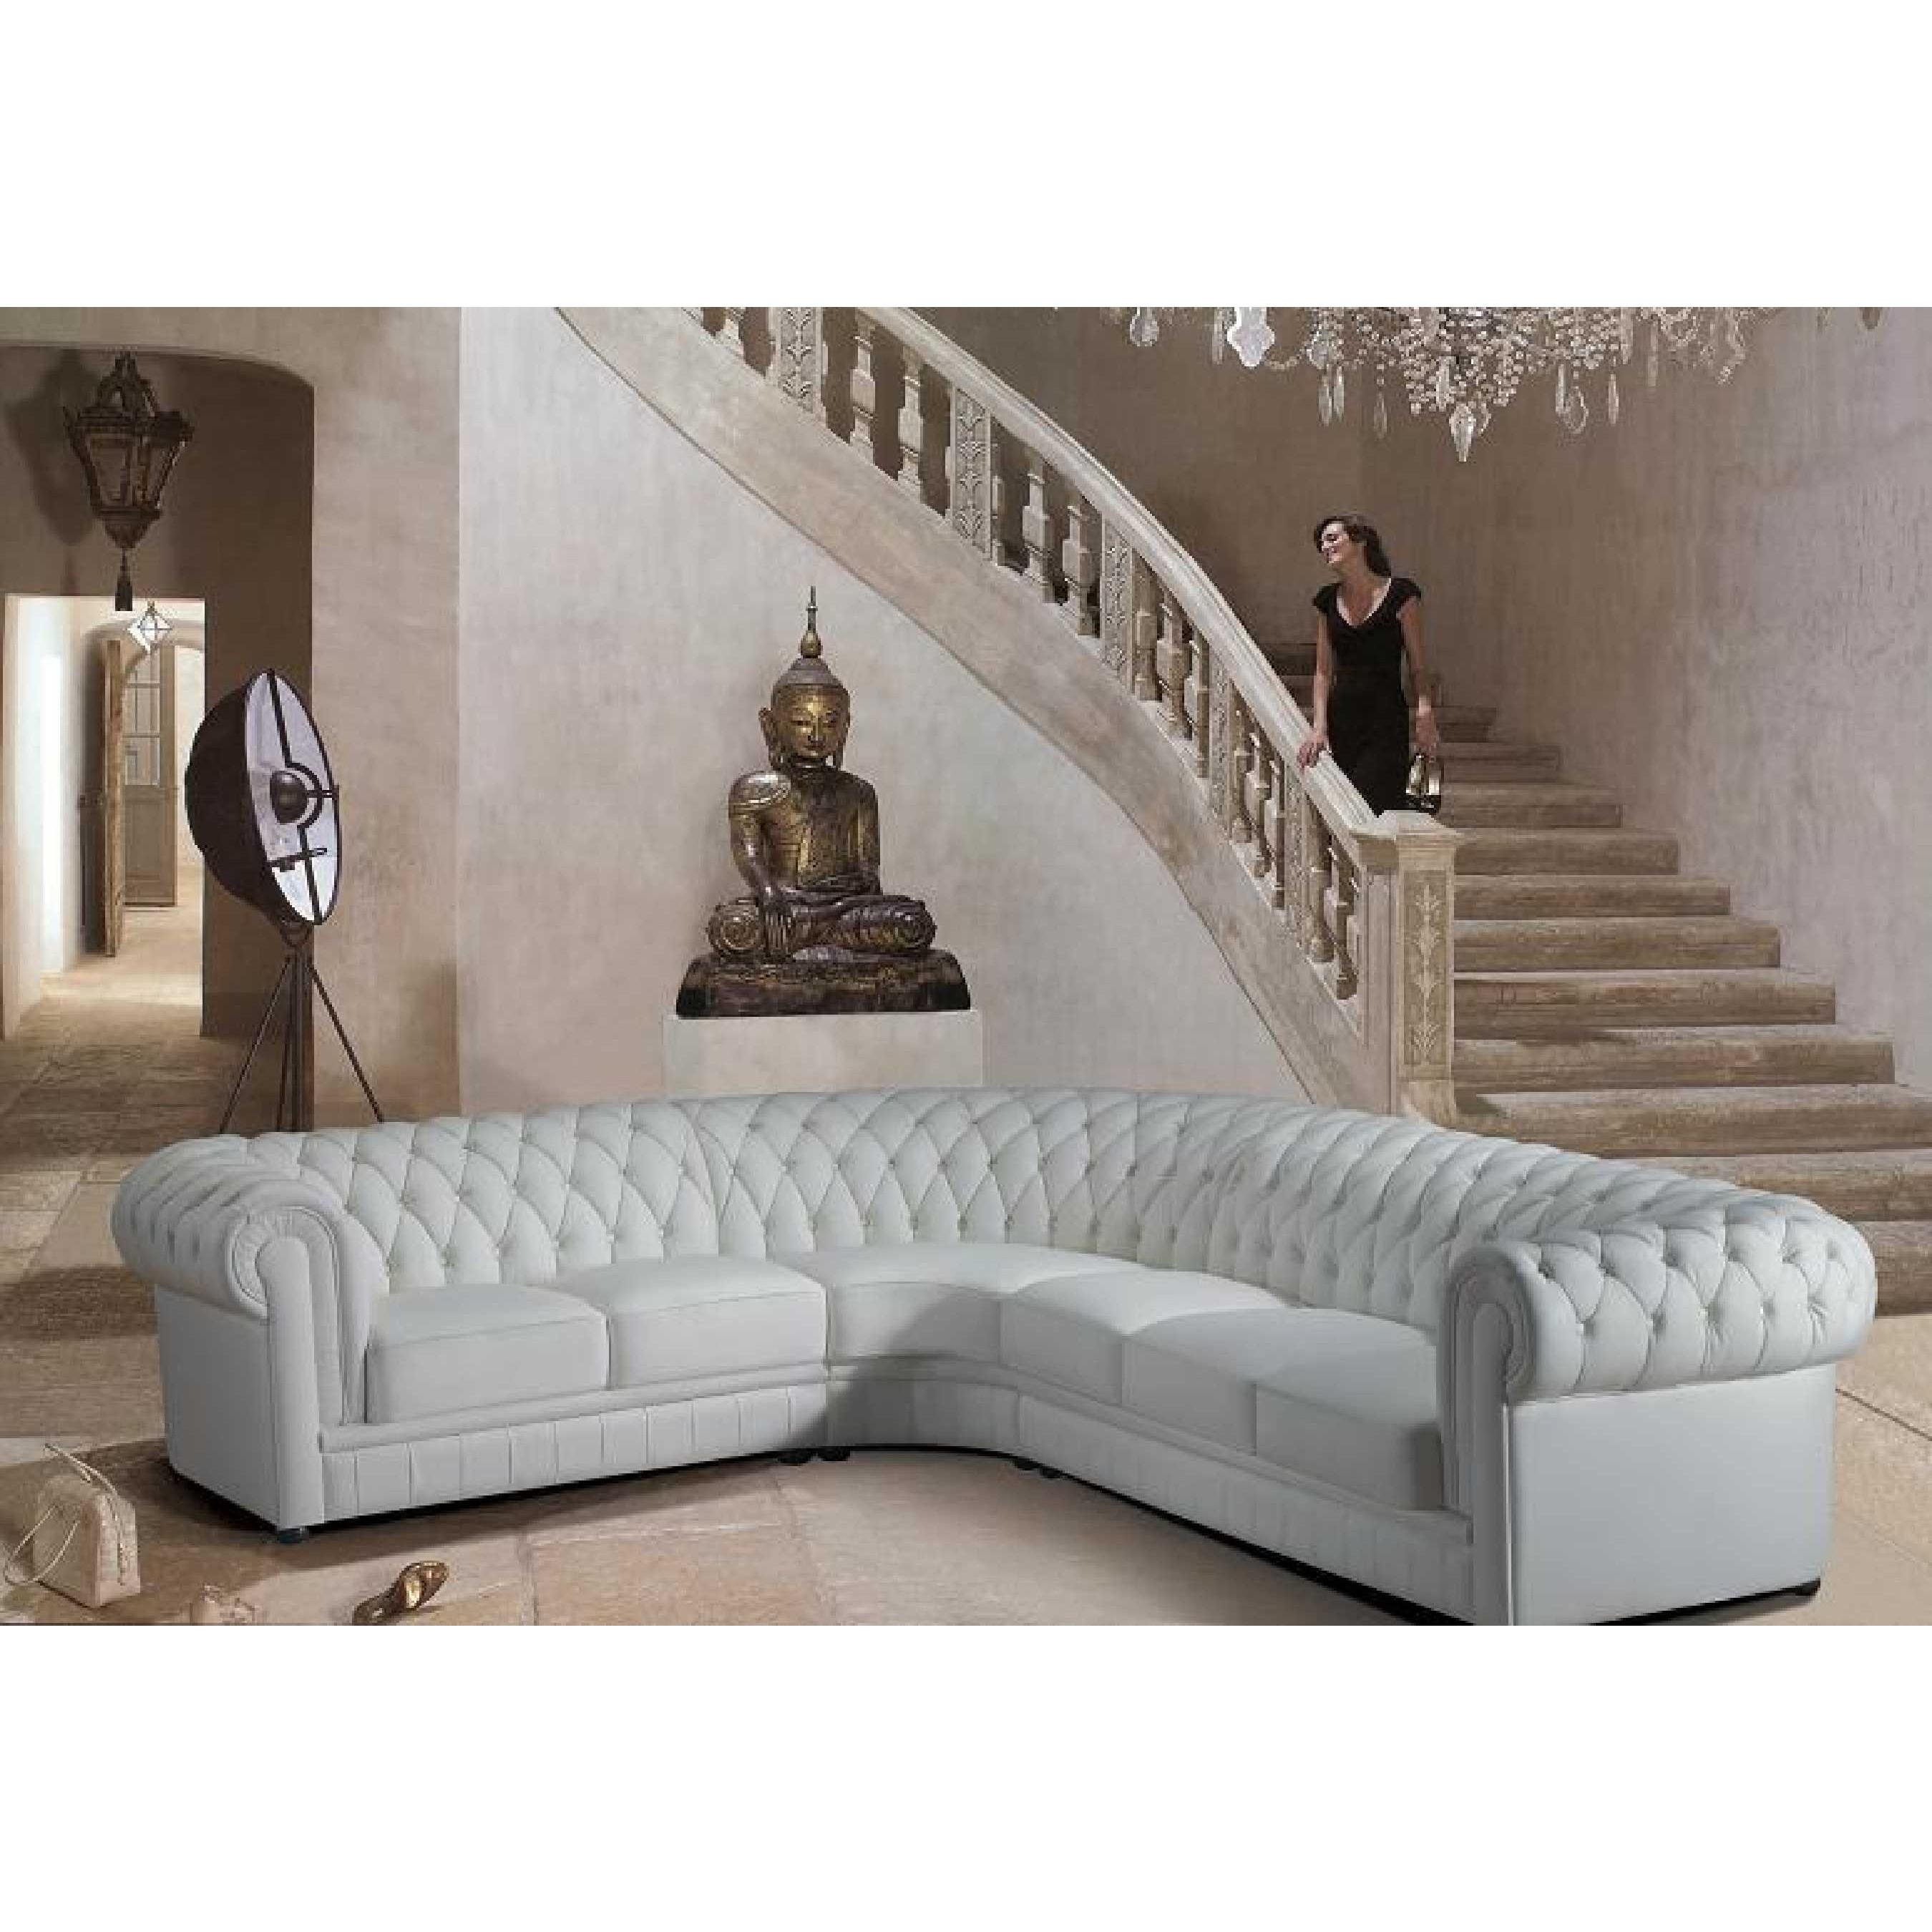 Bedroom Excellent Modern Interior Furniture Design Vig With Affordable Tufted Sofa (View 9 of 15)